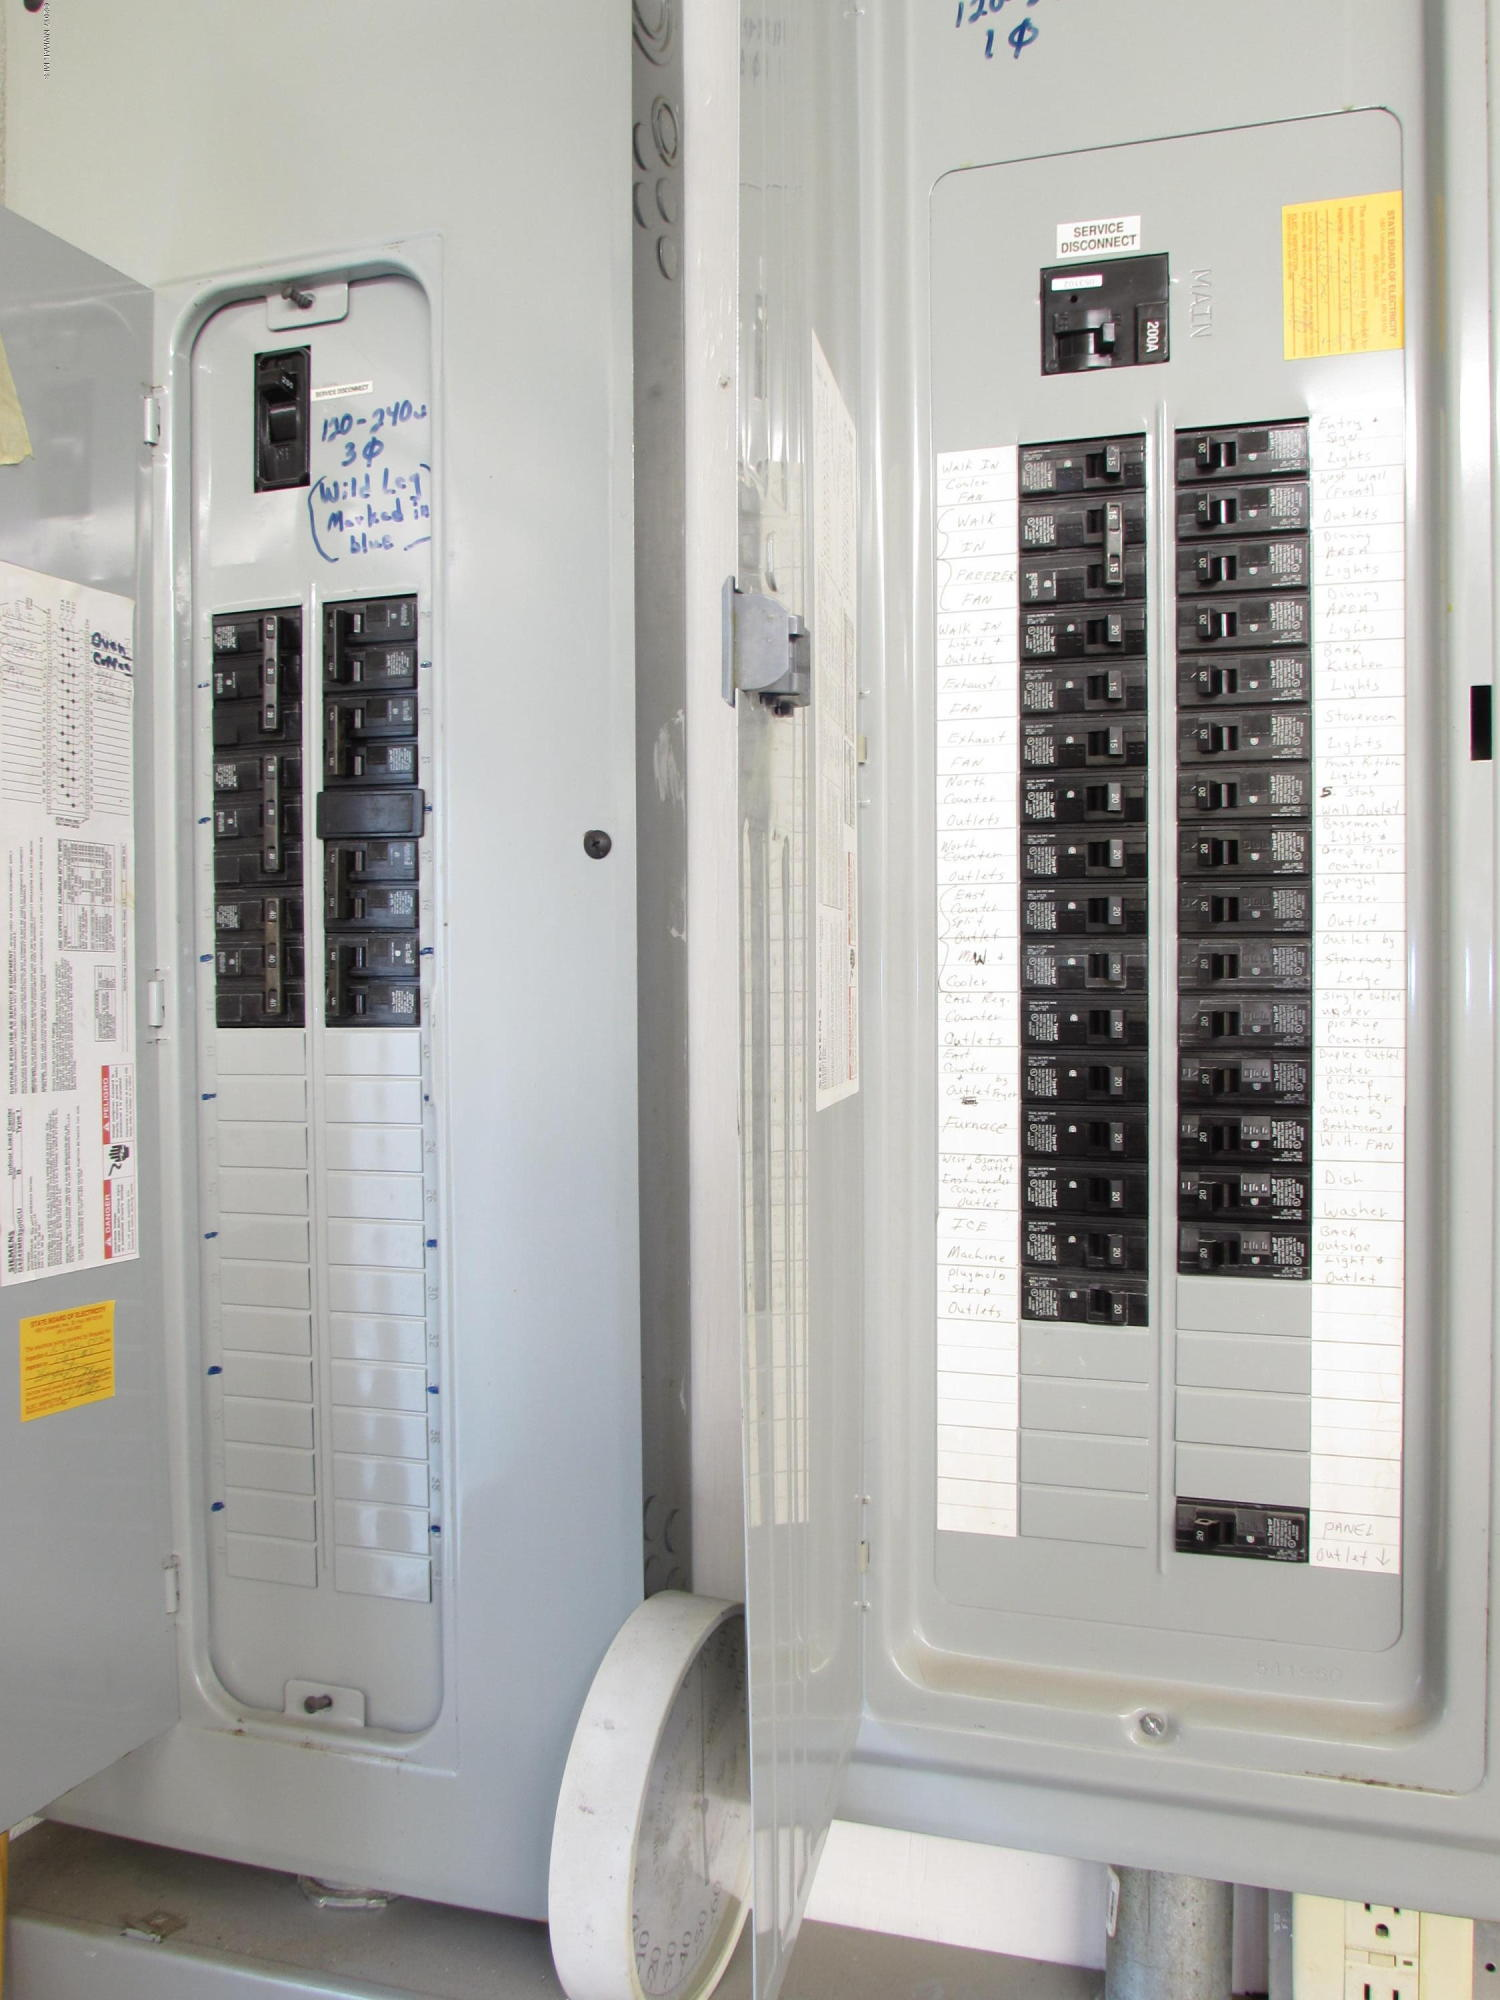 2 - 200 Amp Service Panels